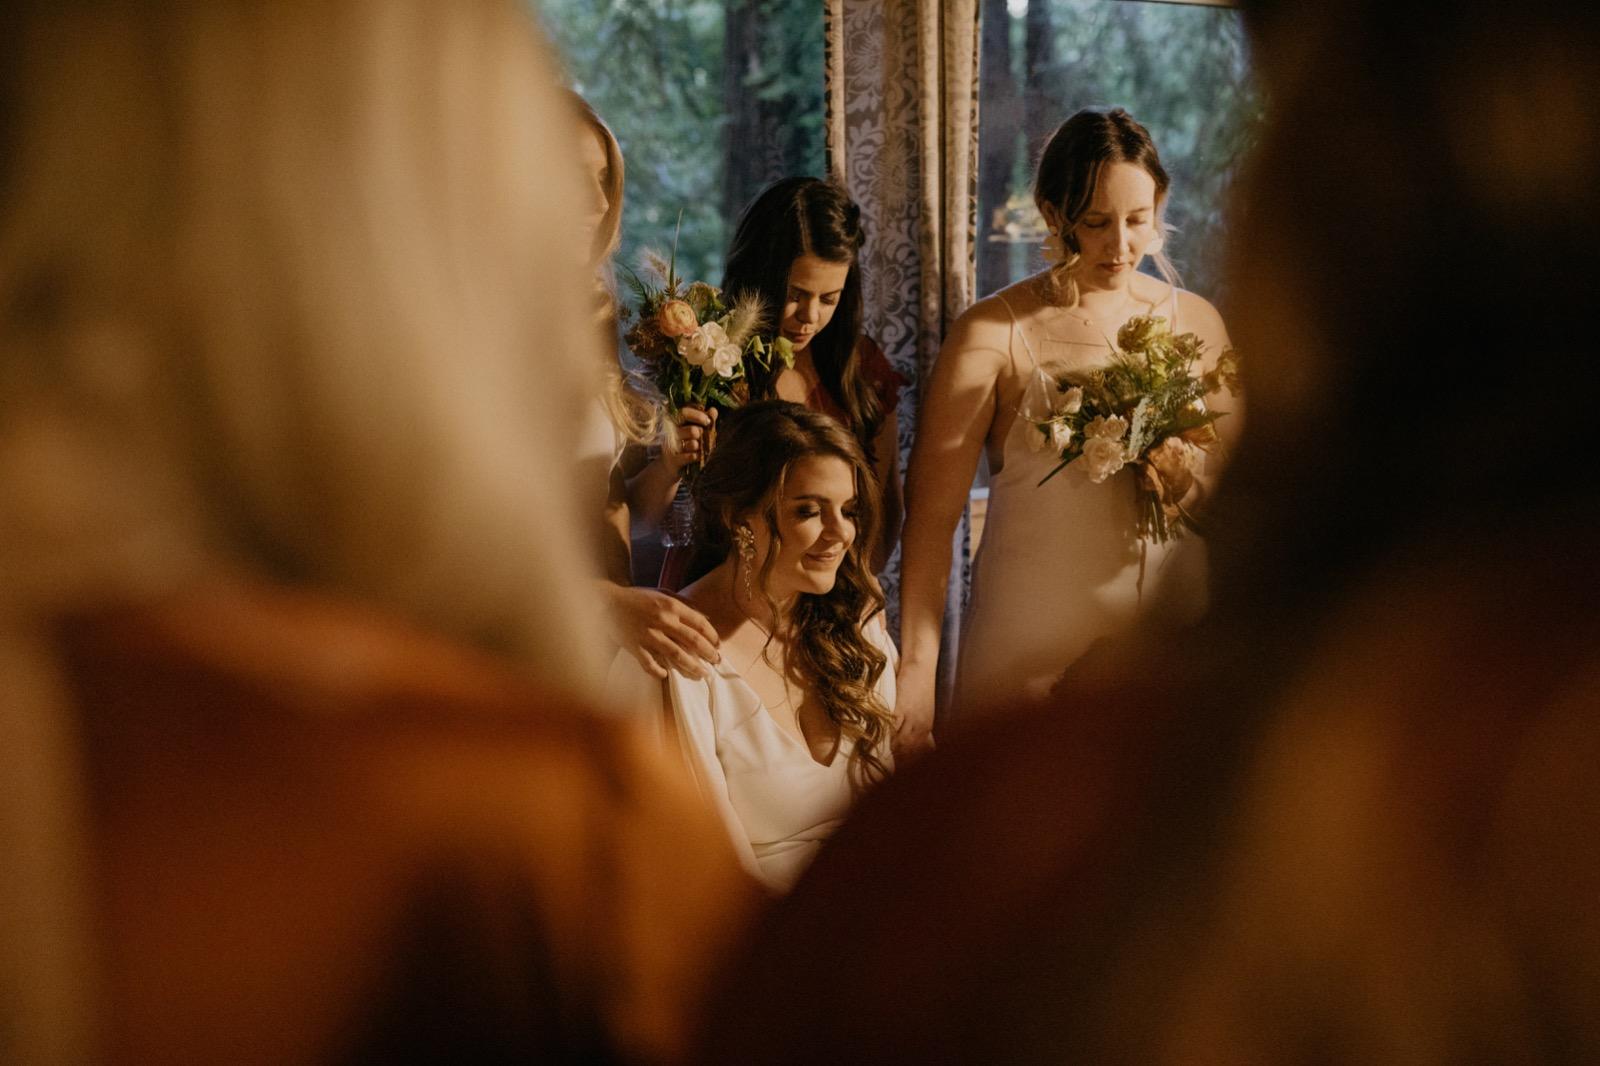 053_Emily & Jeff Wedding 0521c_the-waterfall-lodge_forest_wedding_ben-lomond_intimate